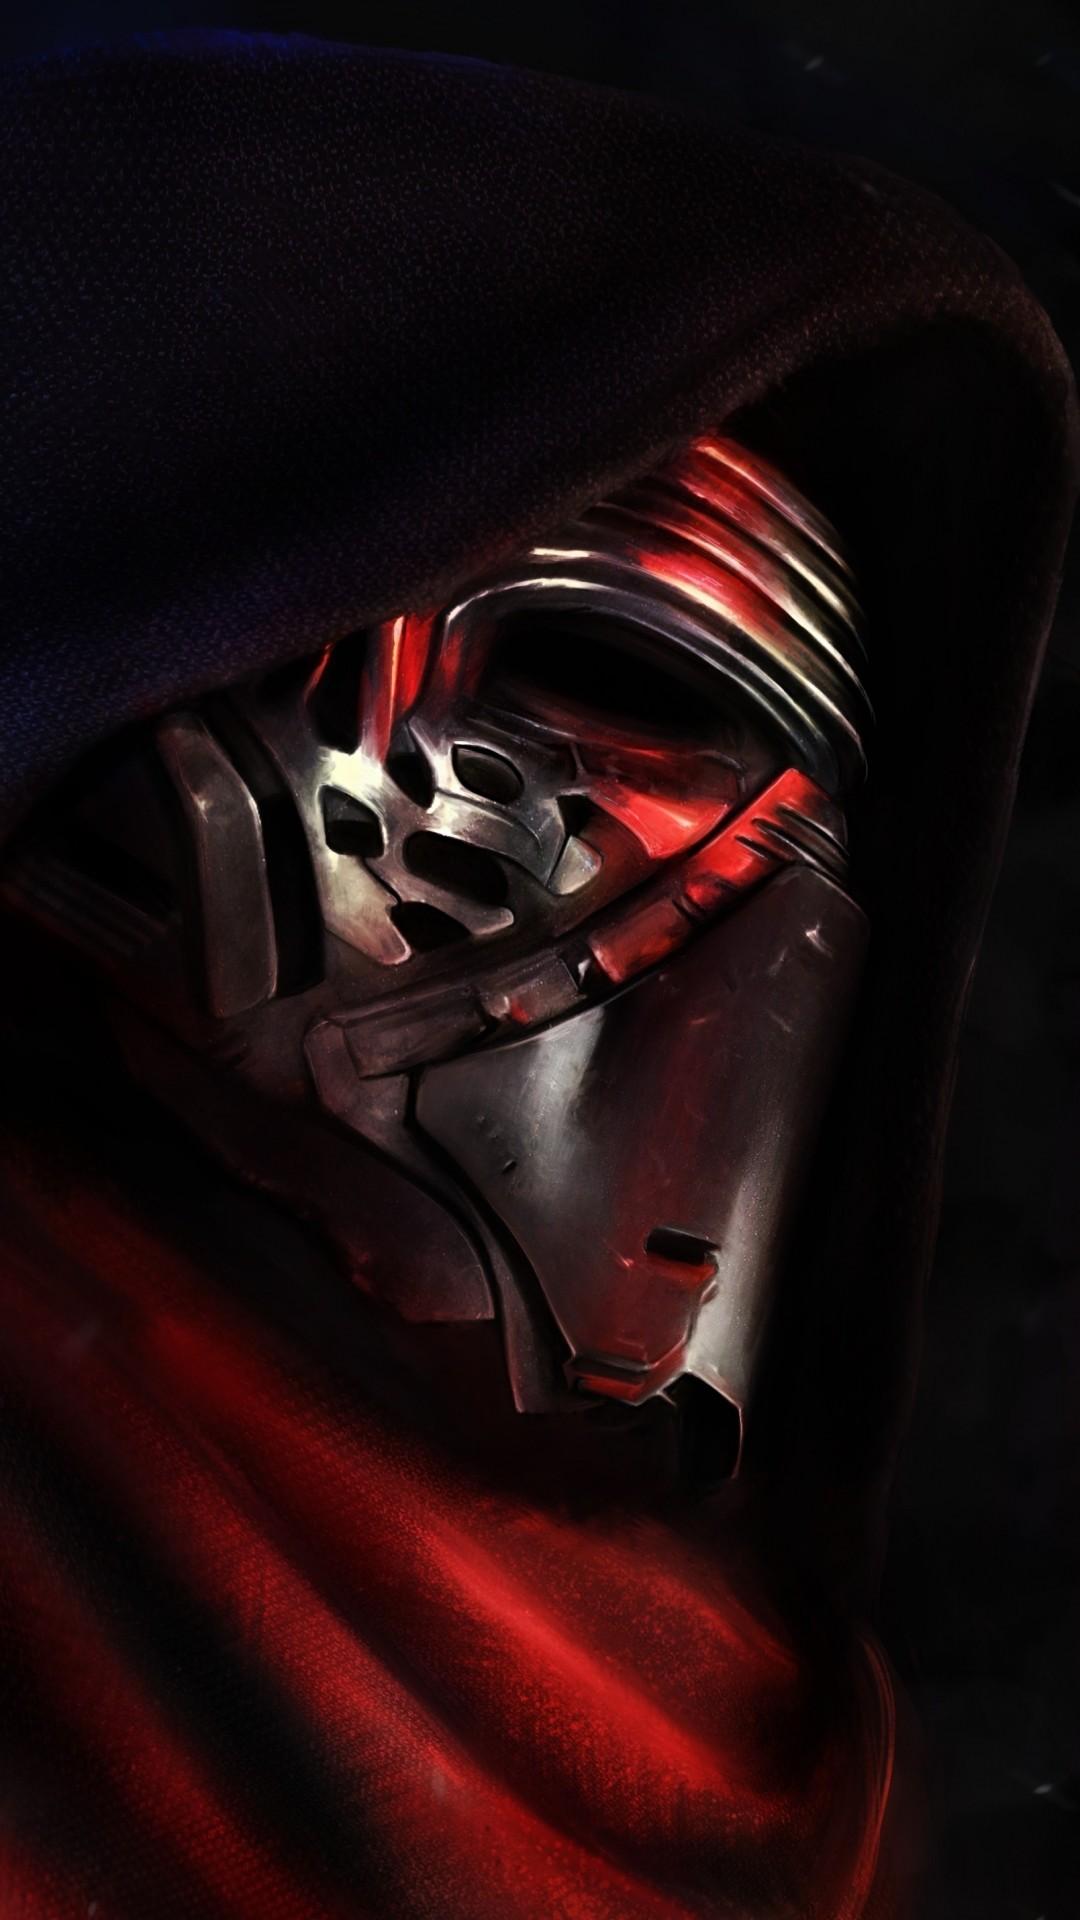 Star Wars The Force Awakens Wallpaper Kylo Ren profile